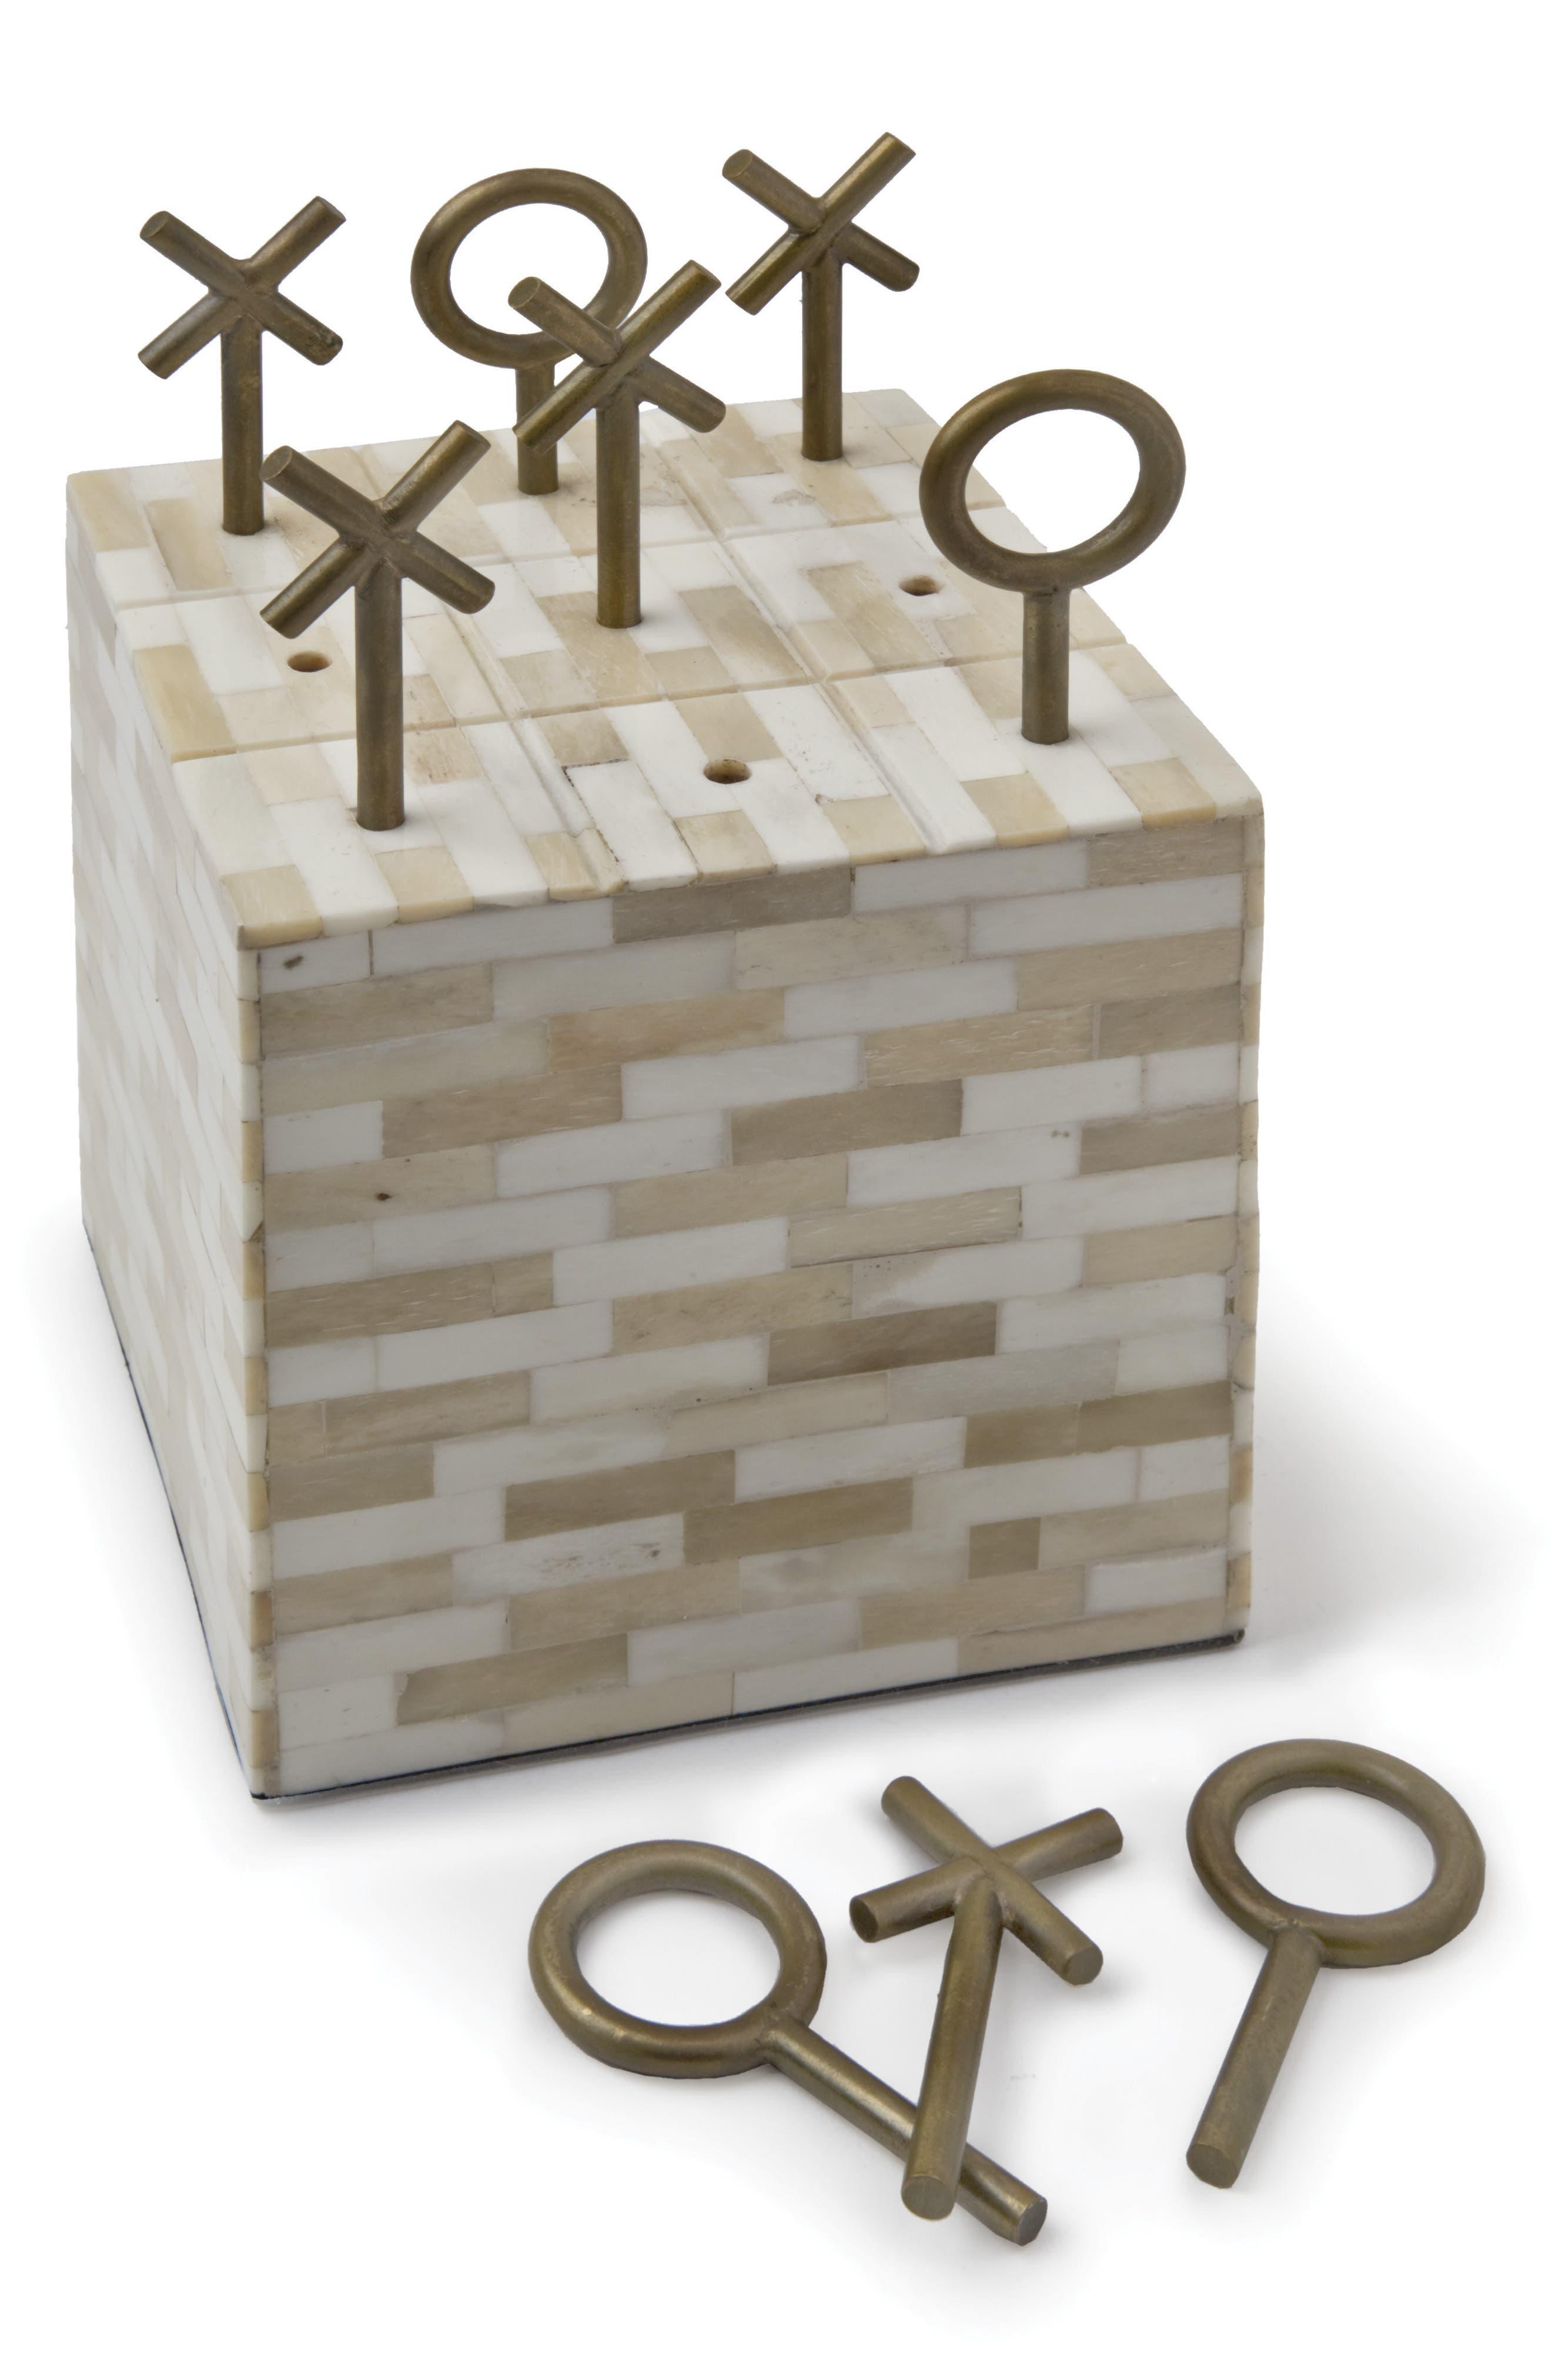 Main Image - Regina Andrew Design Tic Tac Toe Block Game